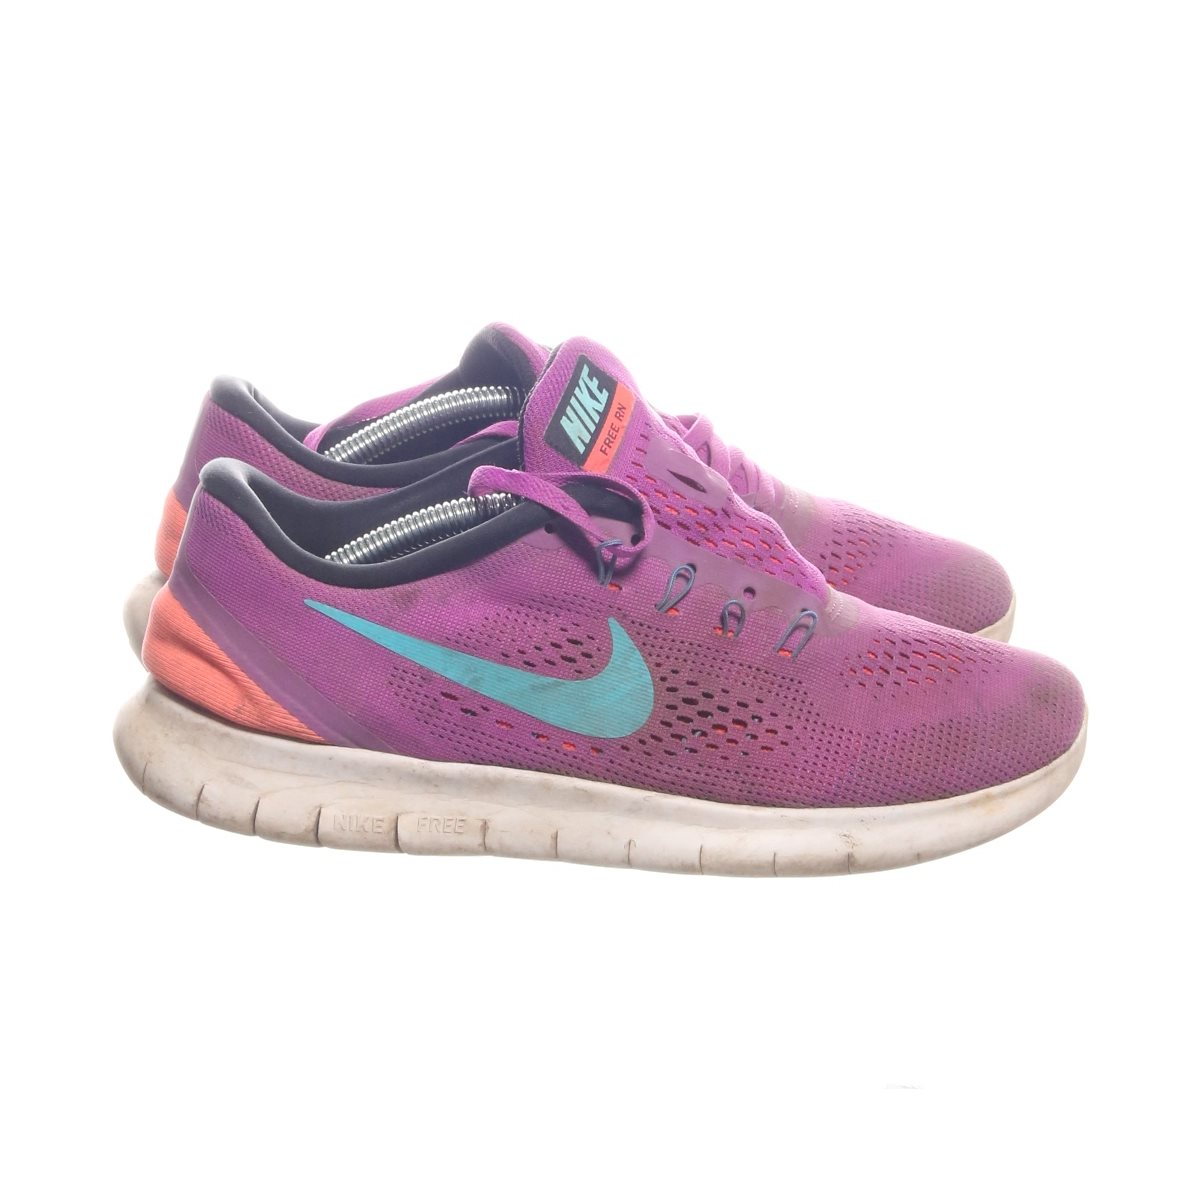 buy popular 8481d 804b4 Nike Free Run, Löparskor, Strl 40,5, LilaFlerfärgad